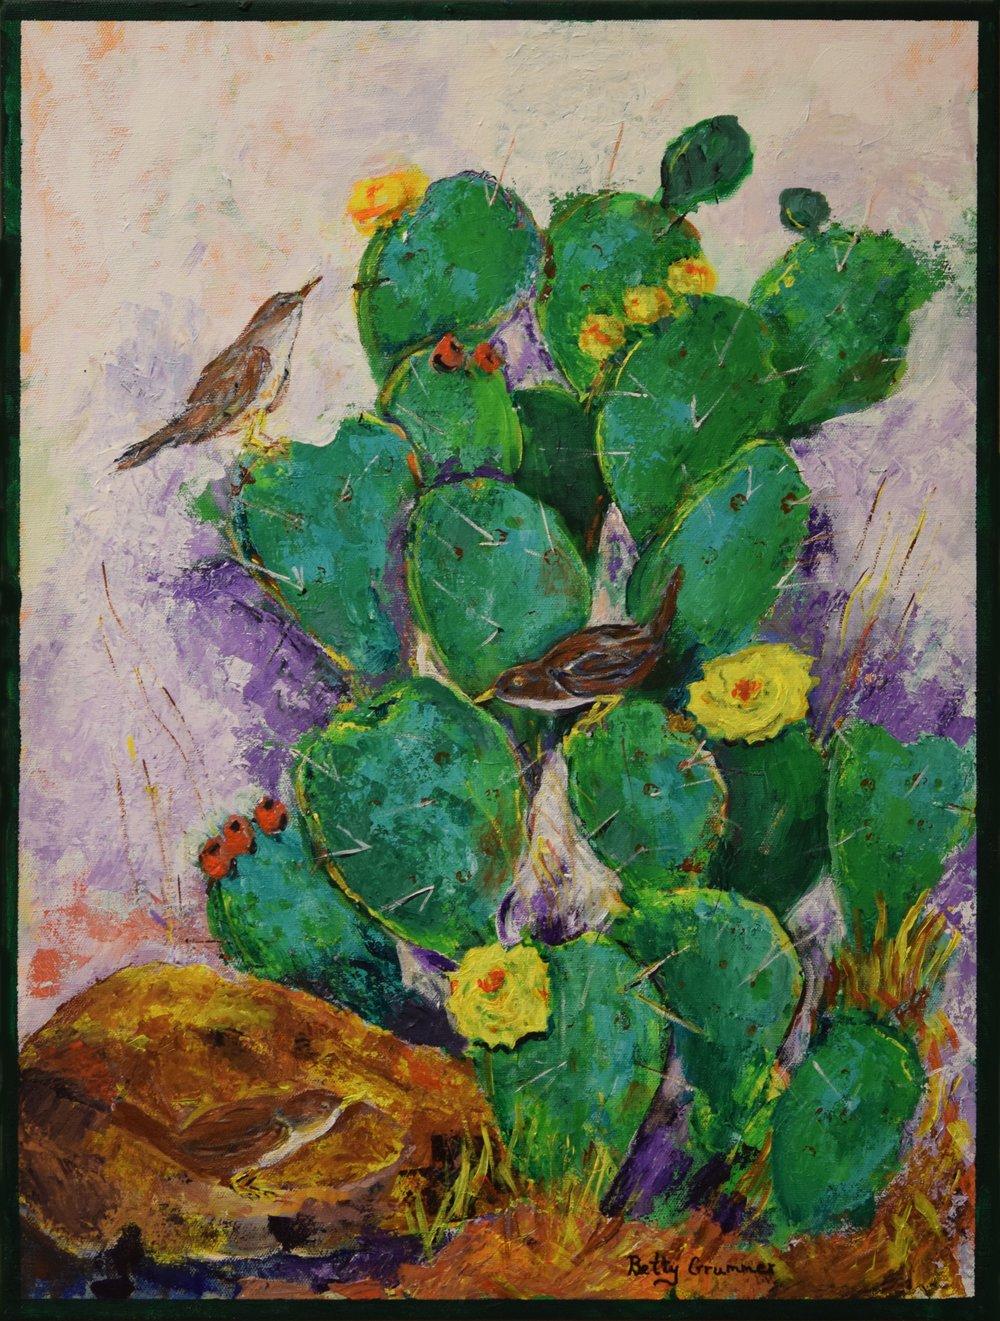 Giddens_Cactus_Betty Grummer.JPG